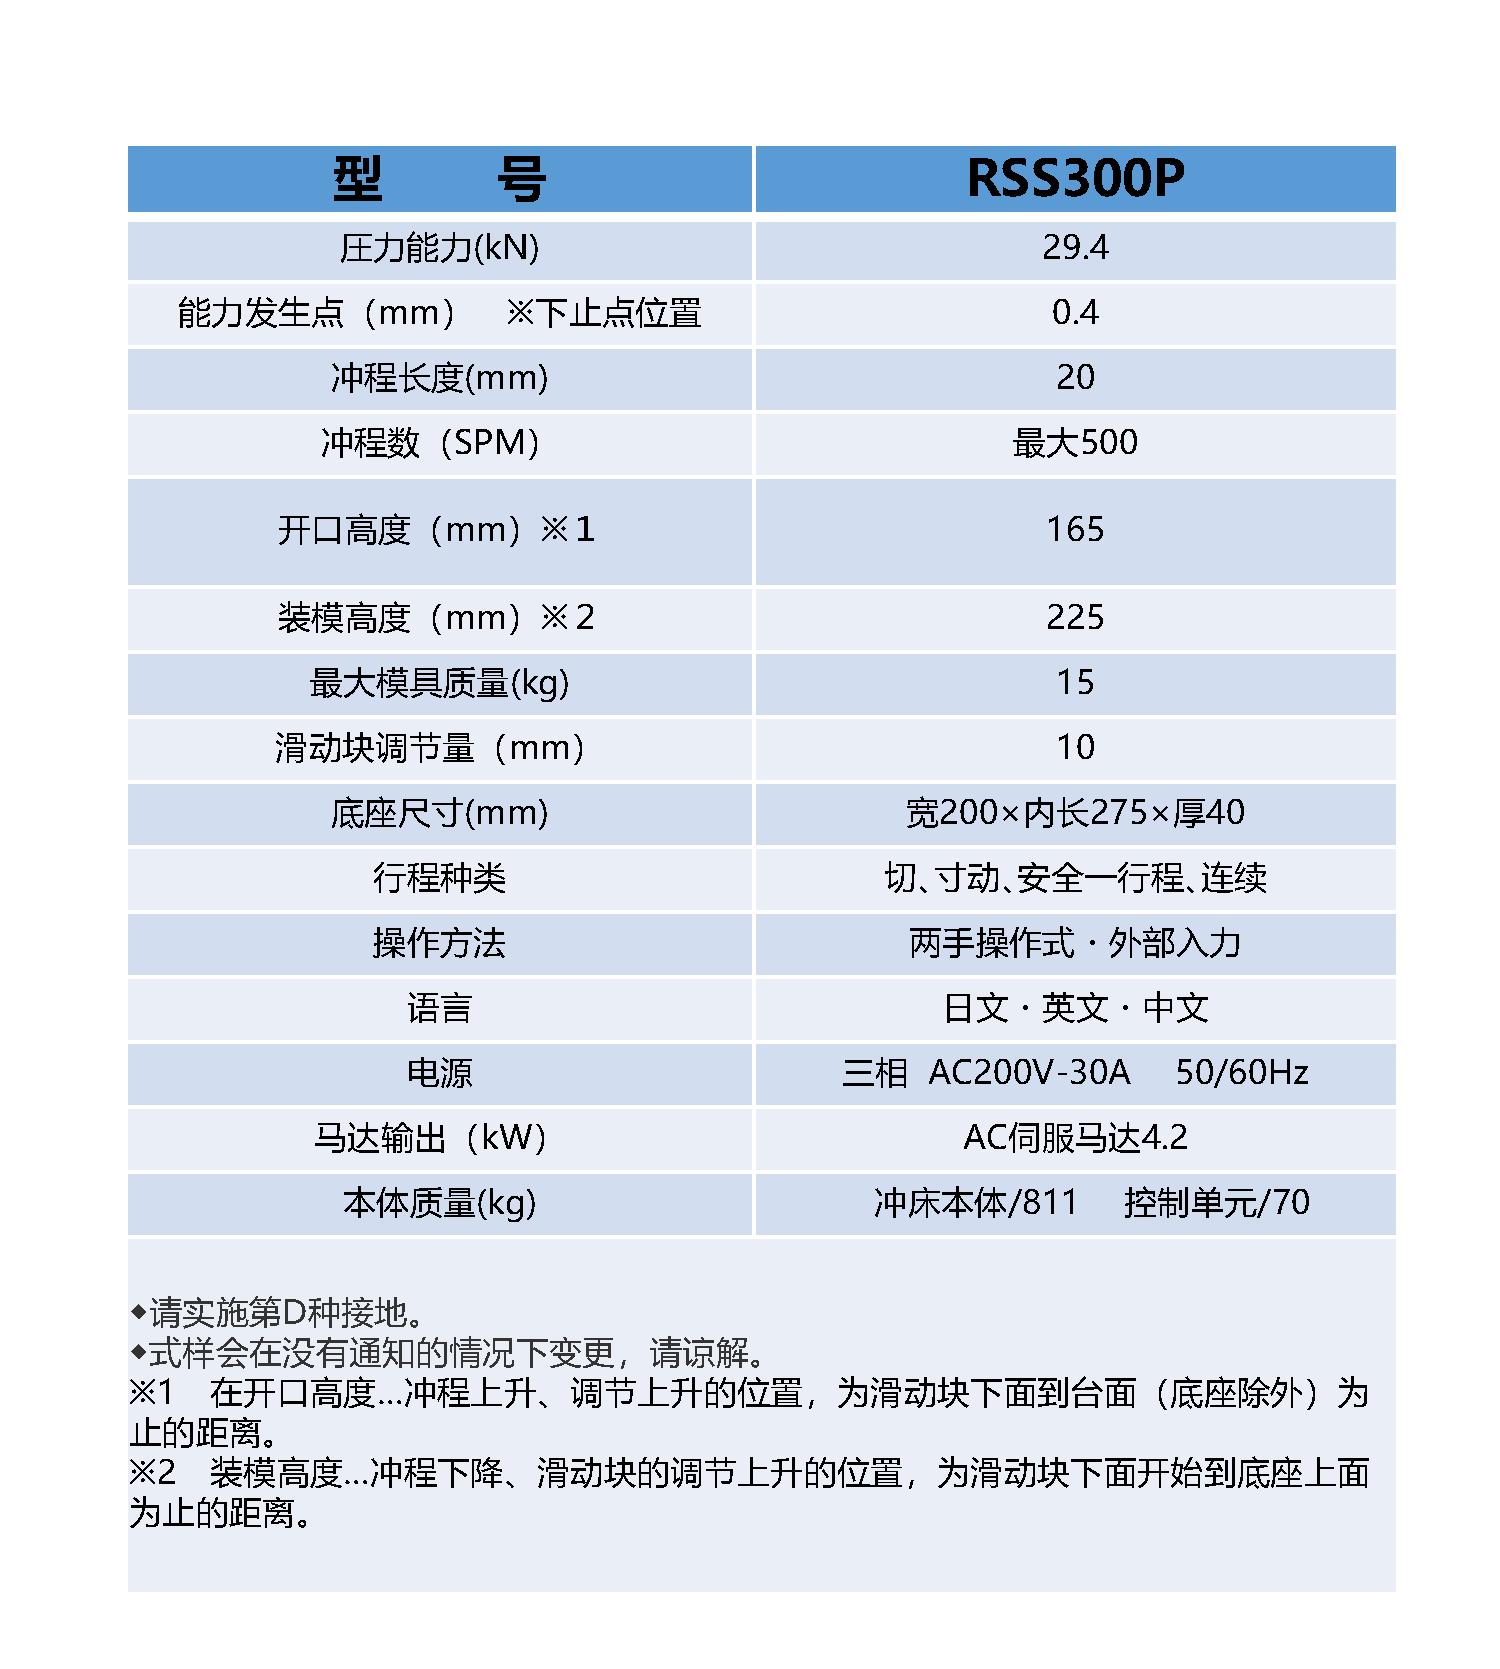 RSS300P_仕様表_新_D - 中文.png